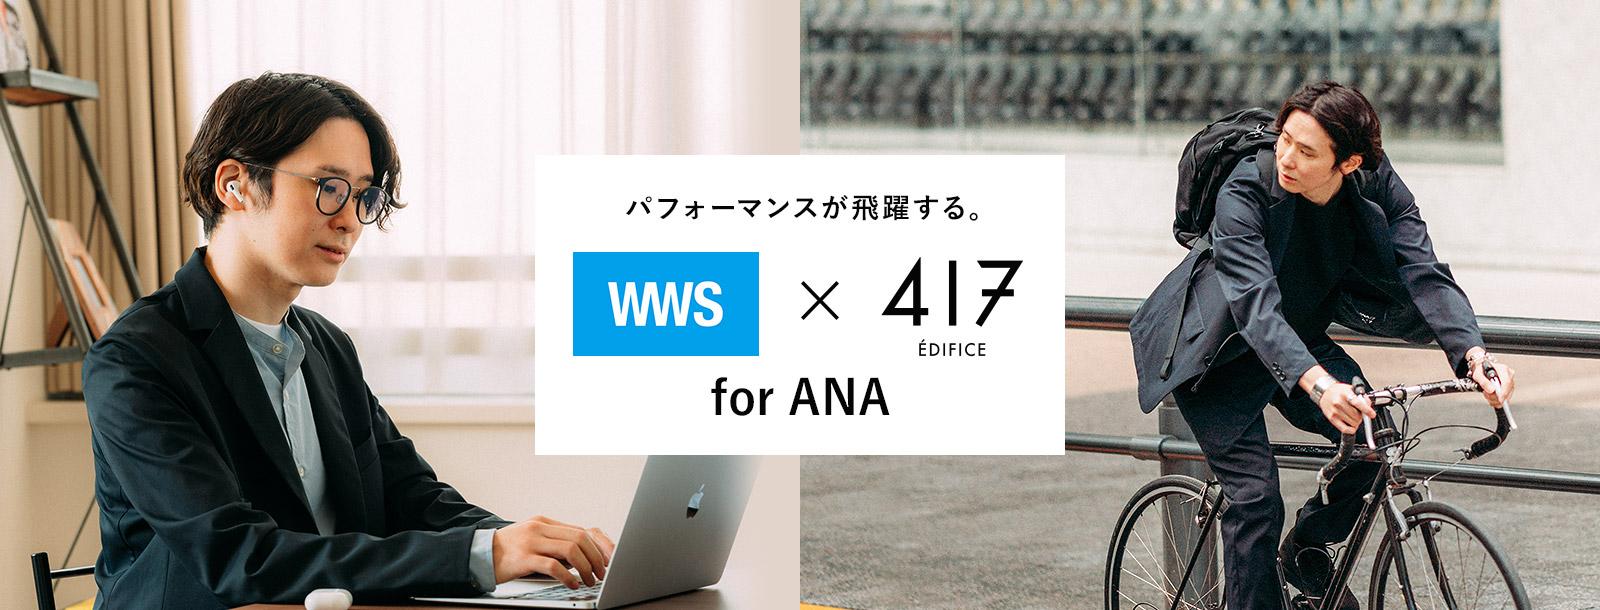 WWS×417 EDIFICE for ANA